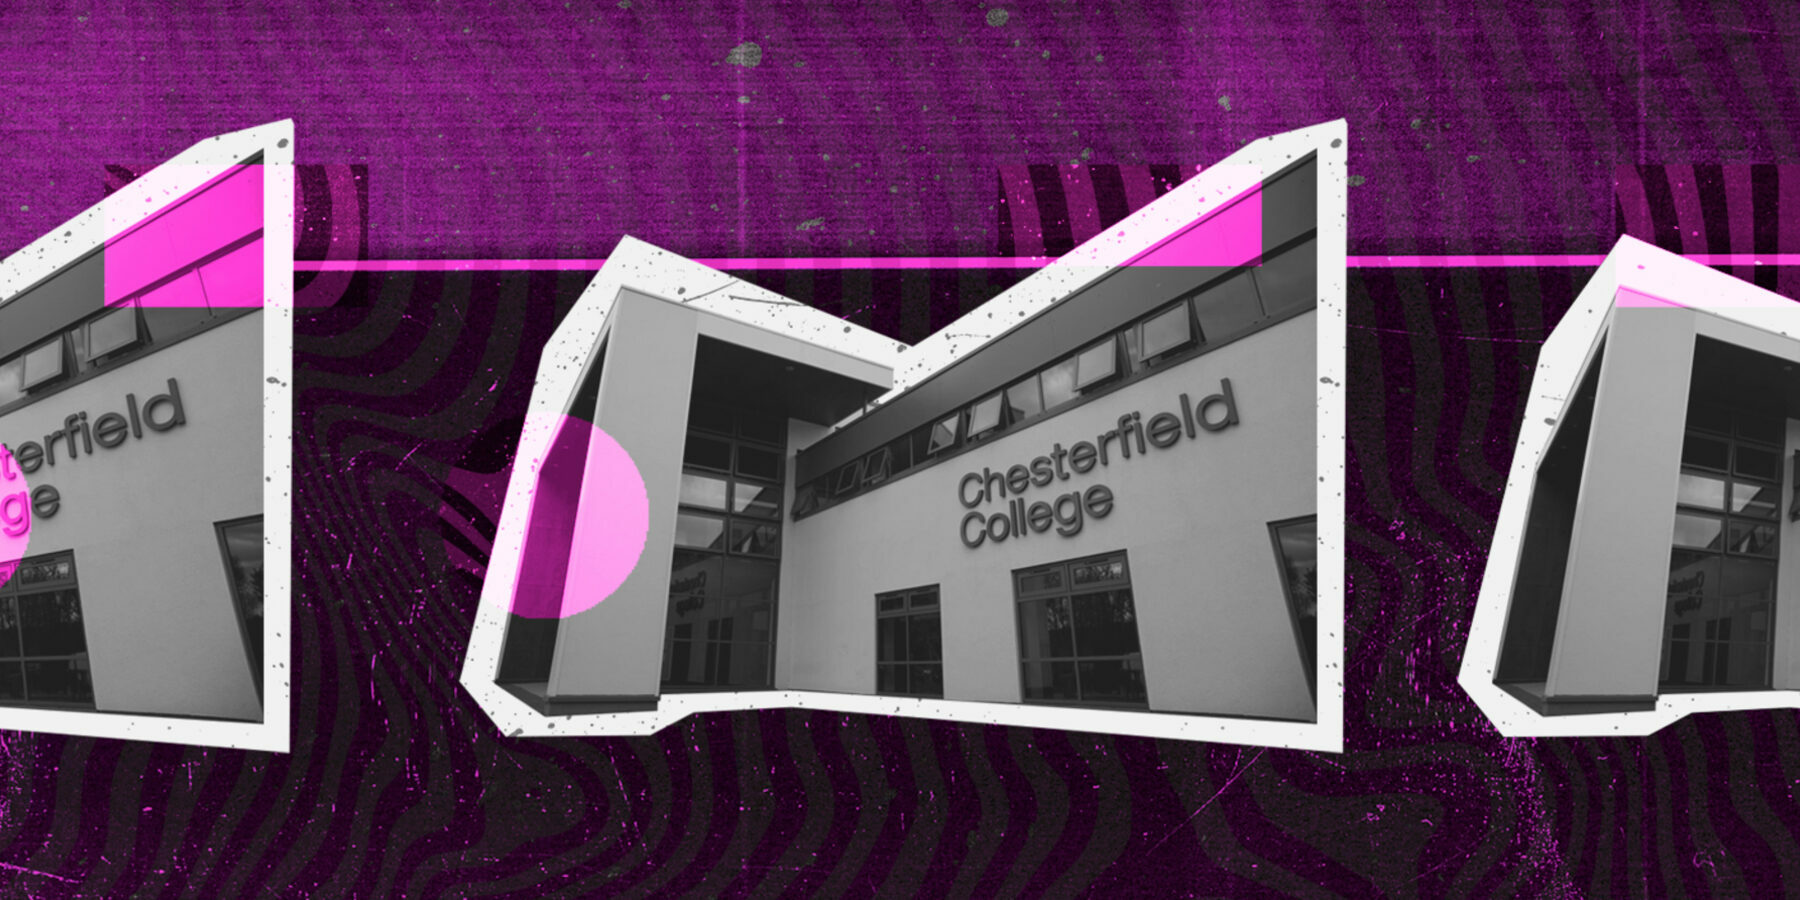 Chesterfield desktop header